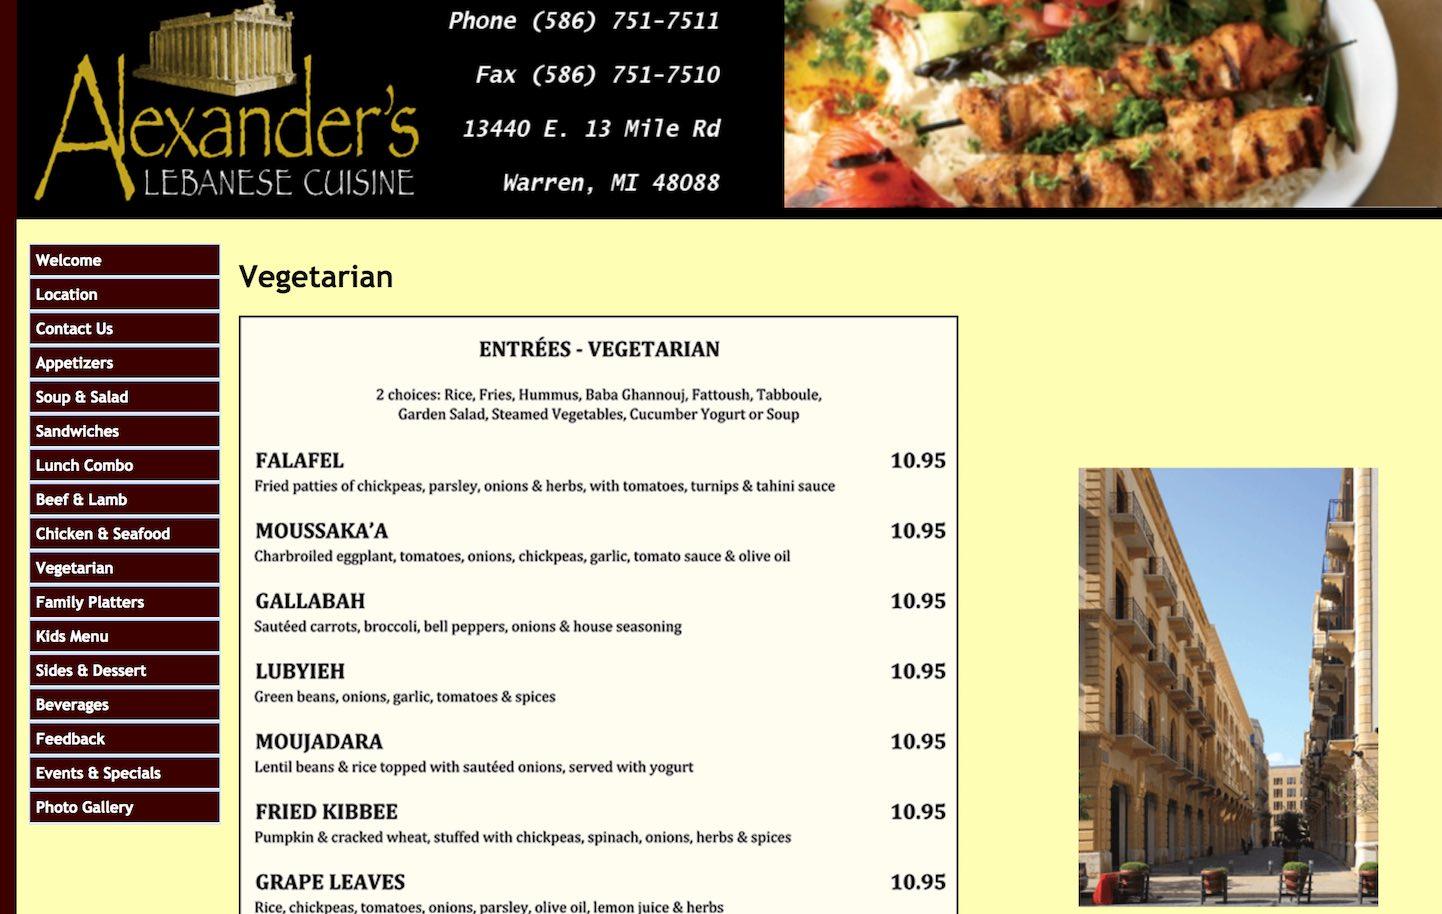 Alexander\'s Lebanese Cuisine in Warren, Michigan 10% Senior Discount -